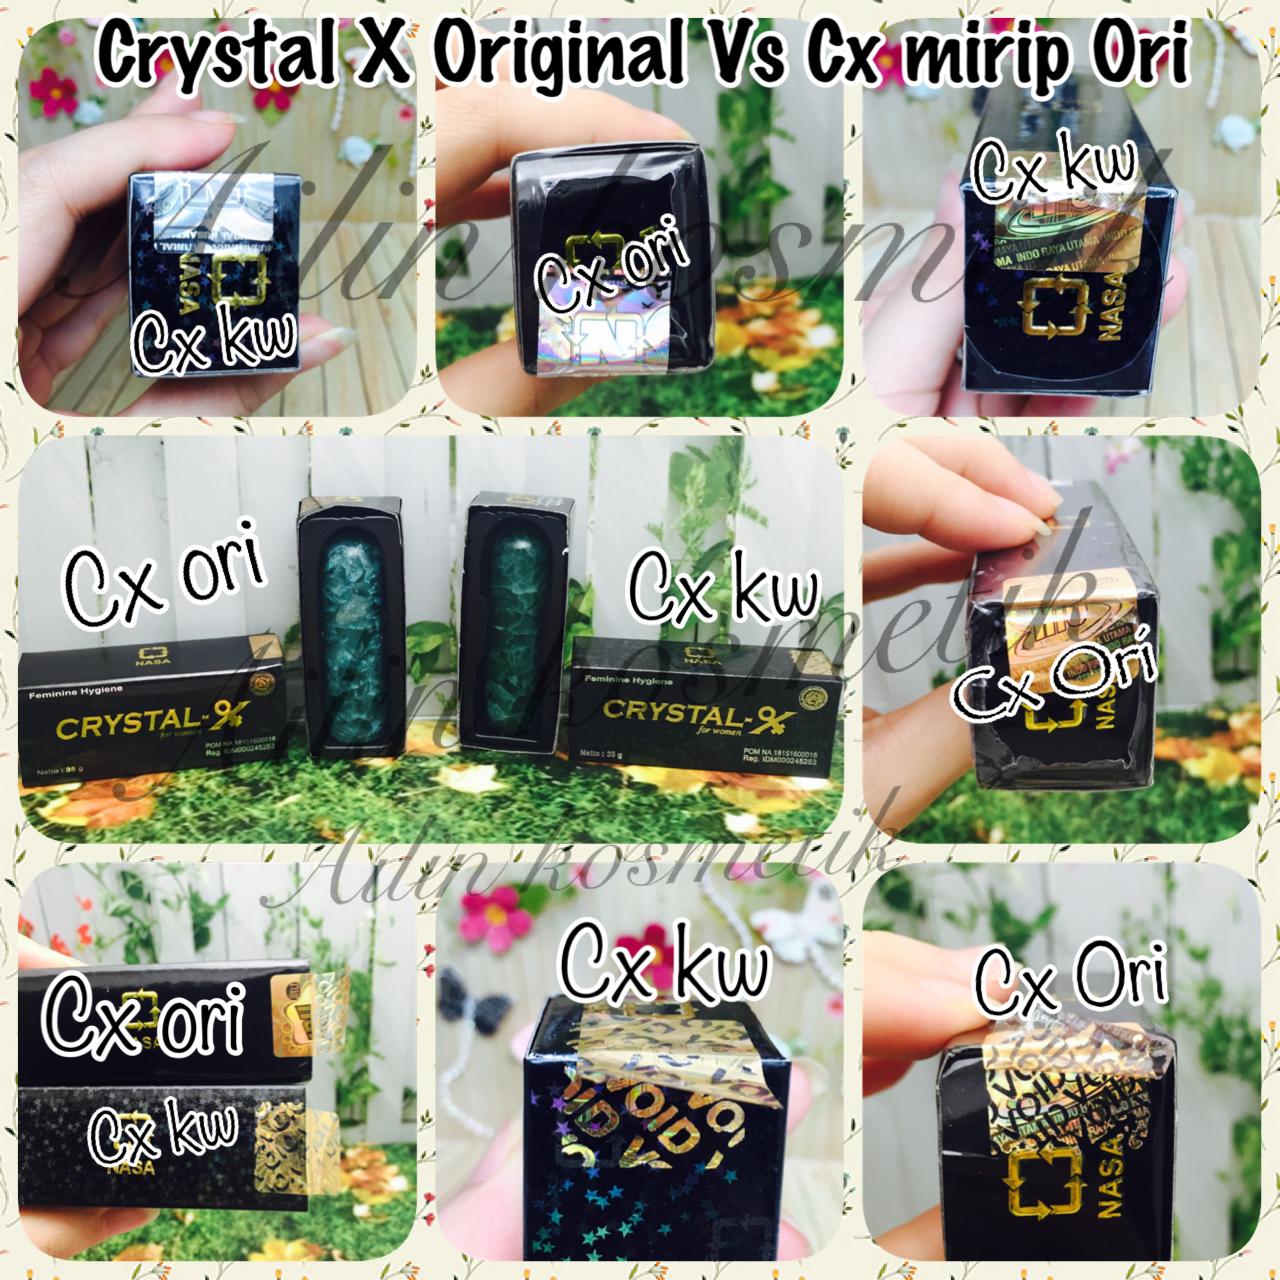 Jual Crystal Xcristal Xkristal Xcxori 100no Seri Berbeda 1 Dgn X Ori Nasa Kristal Asli Yg La Master Piece Tokopedia